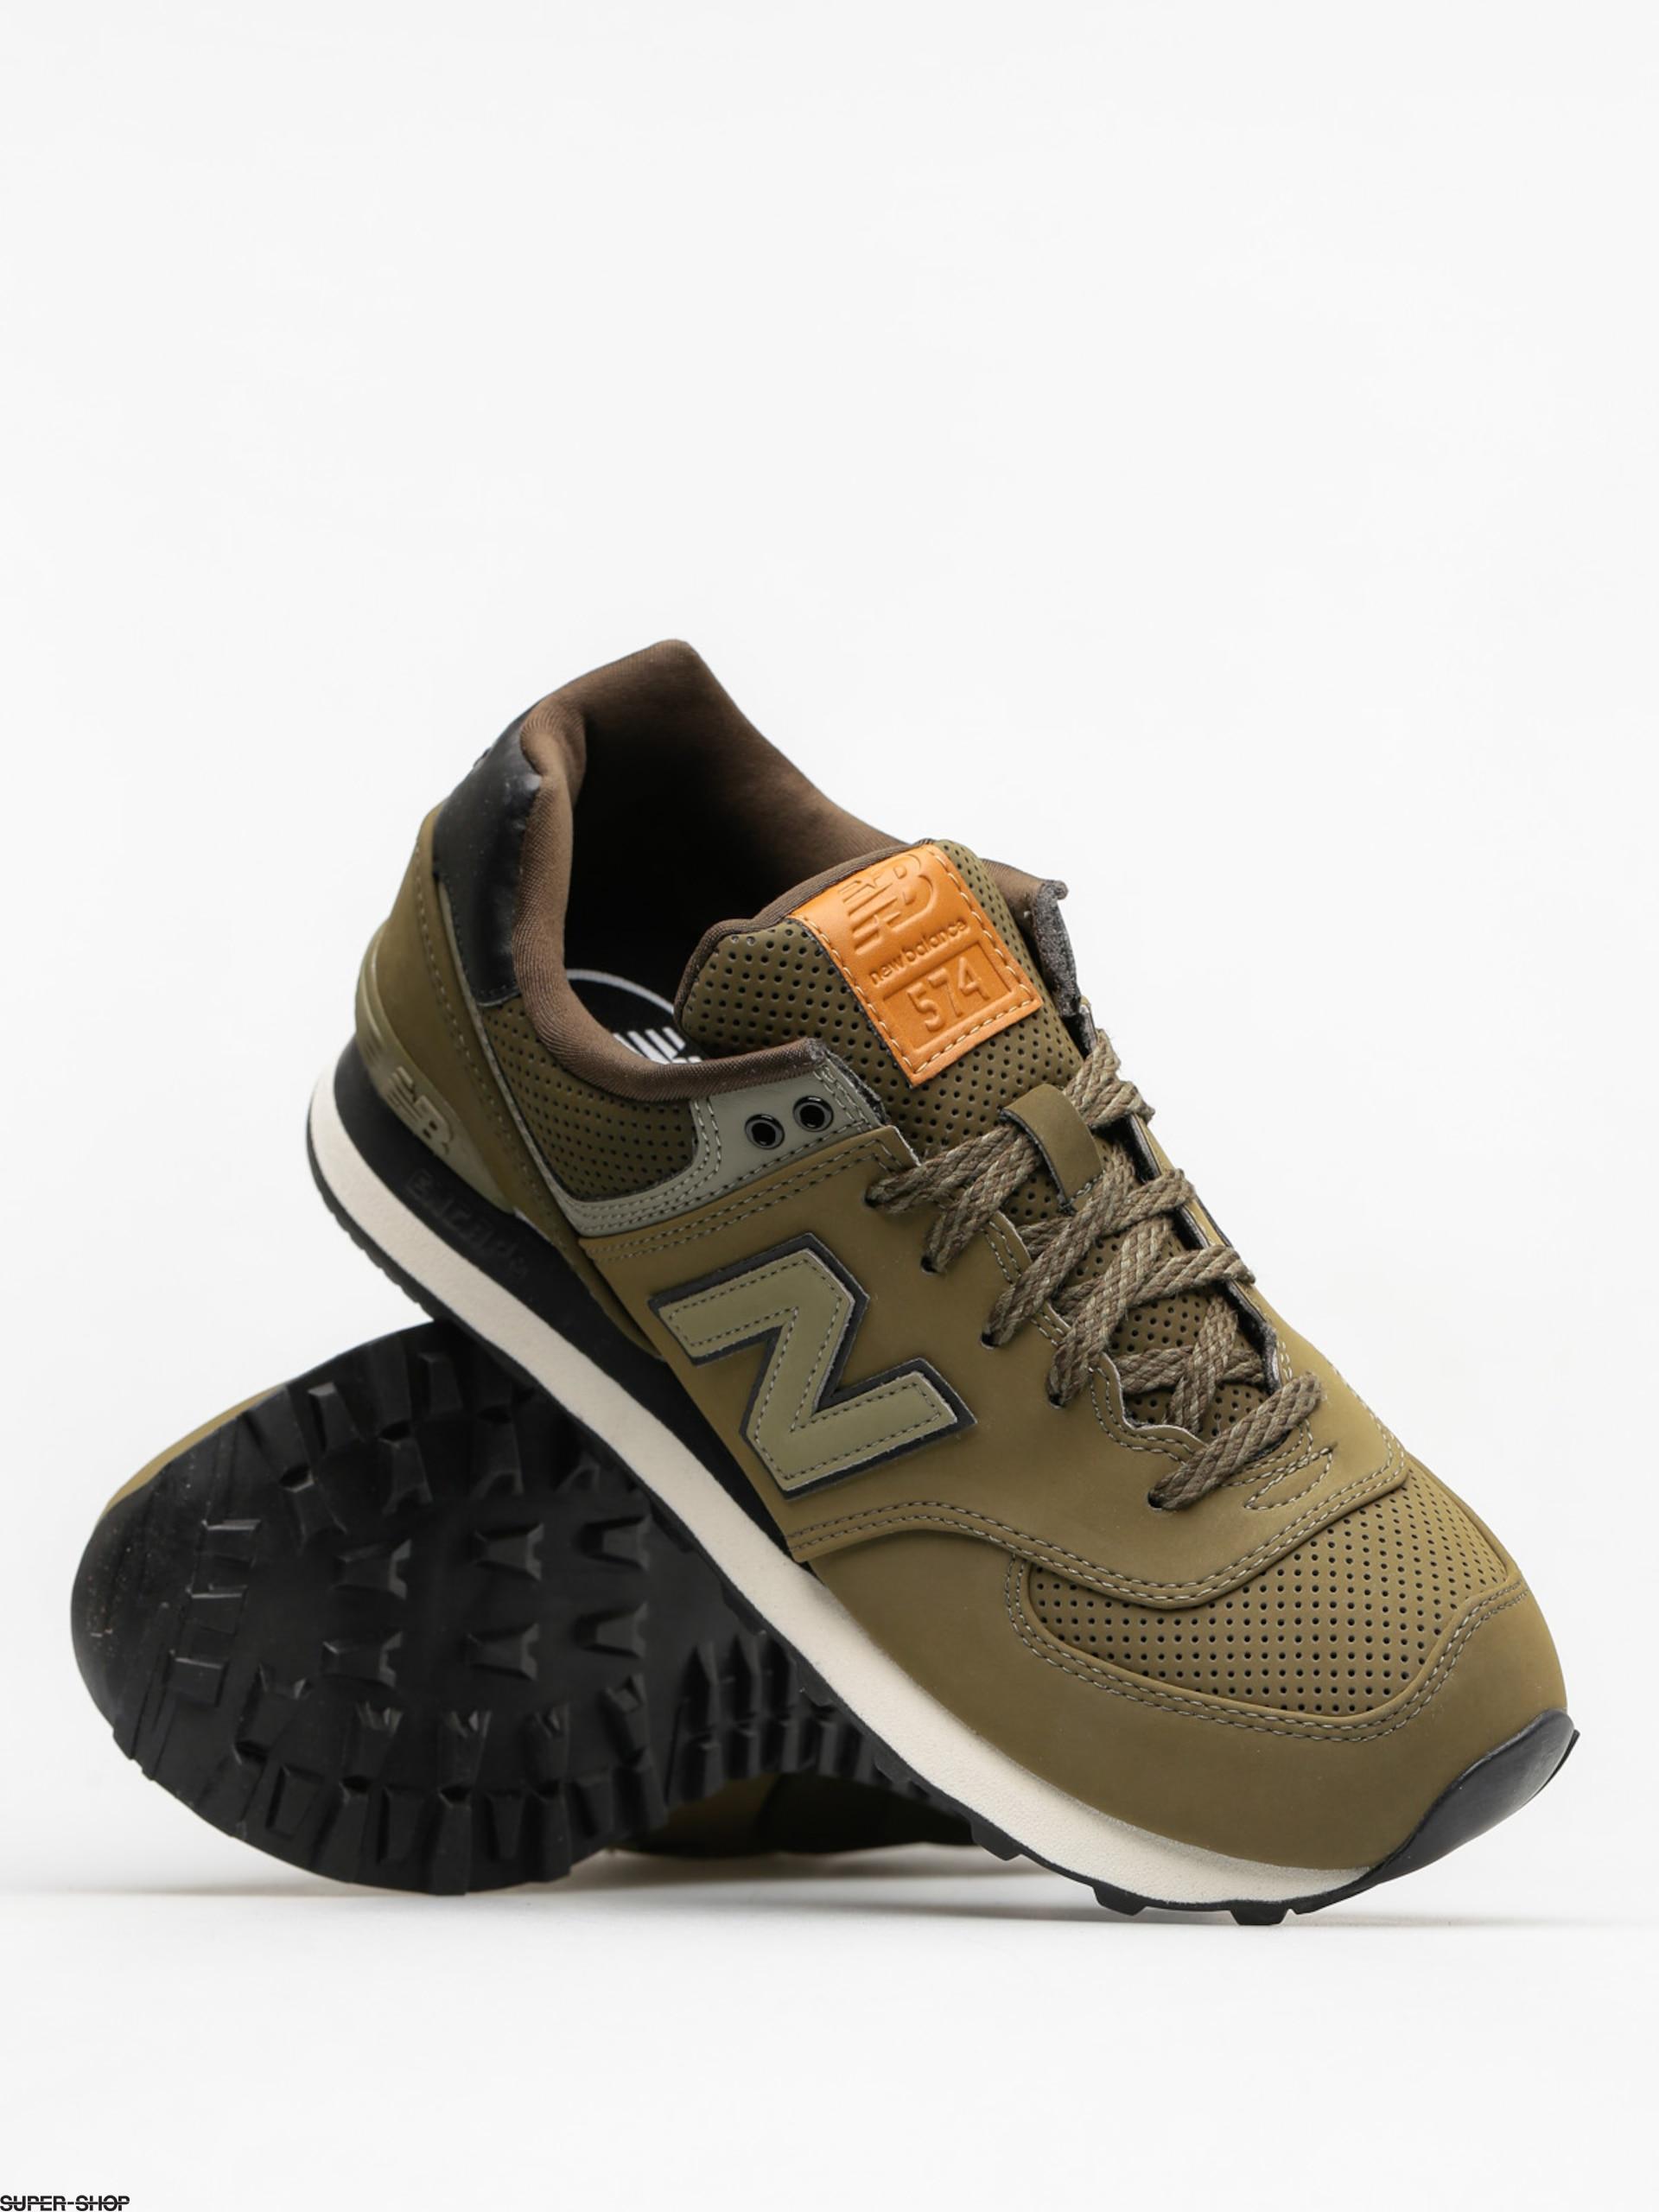 New Balance Shoes 574 (olive)